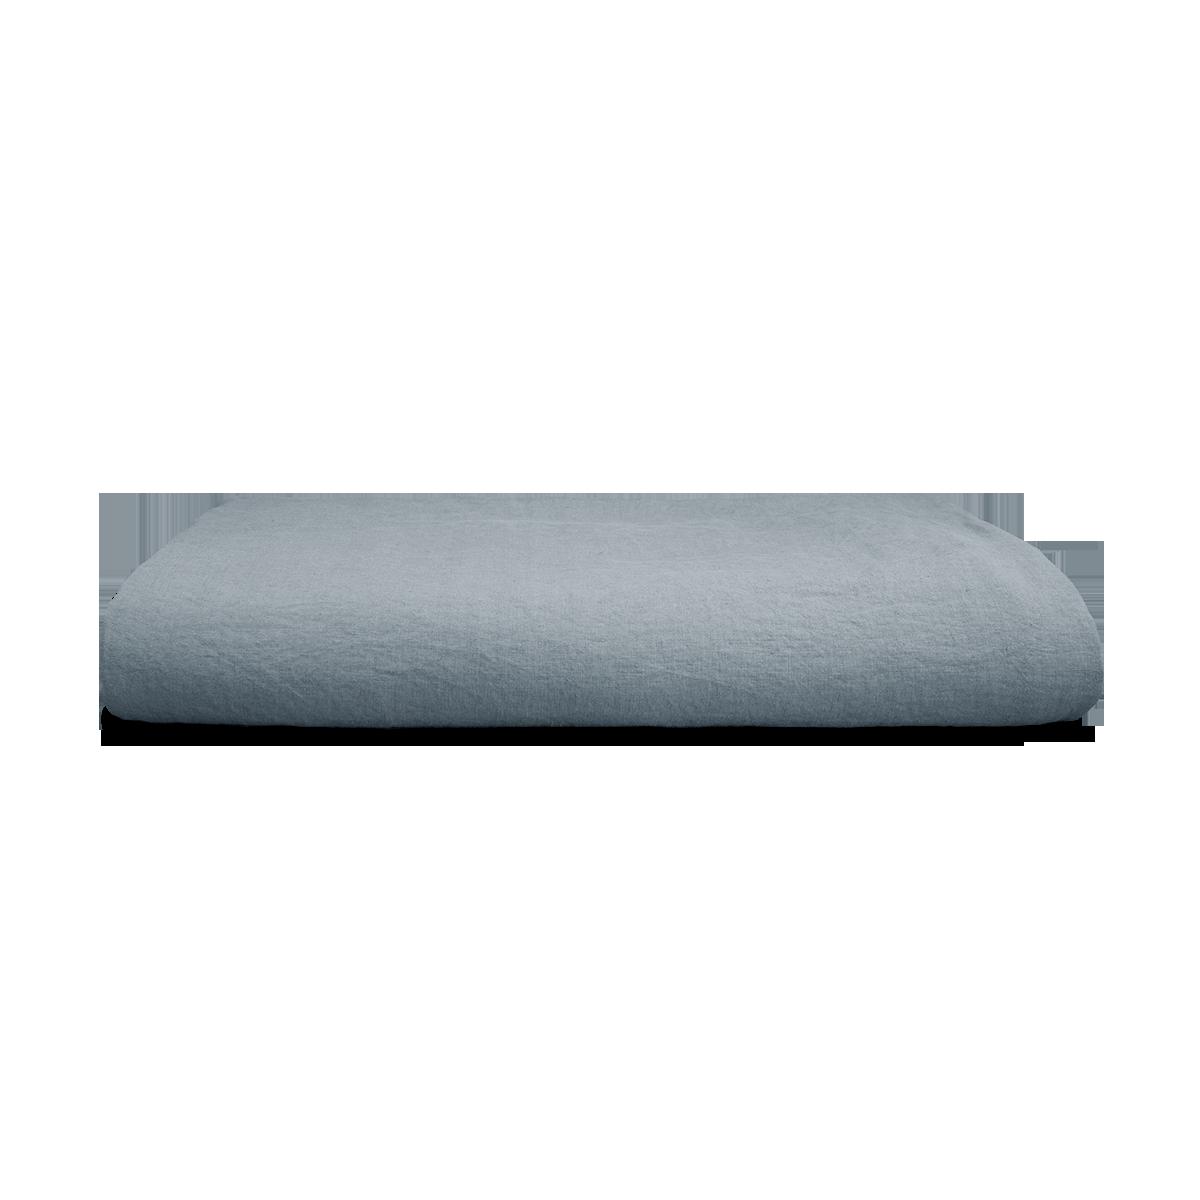 HEY EXCLUSIVE - Flat sheet